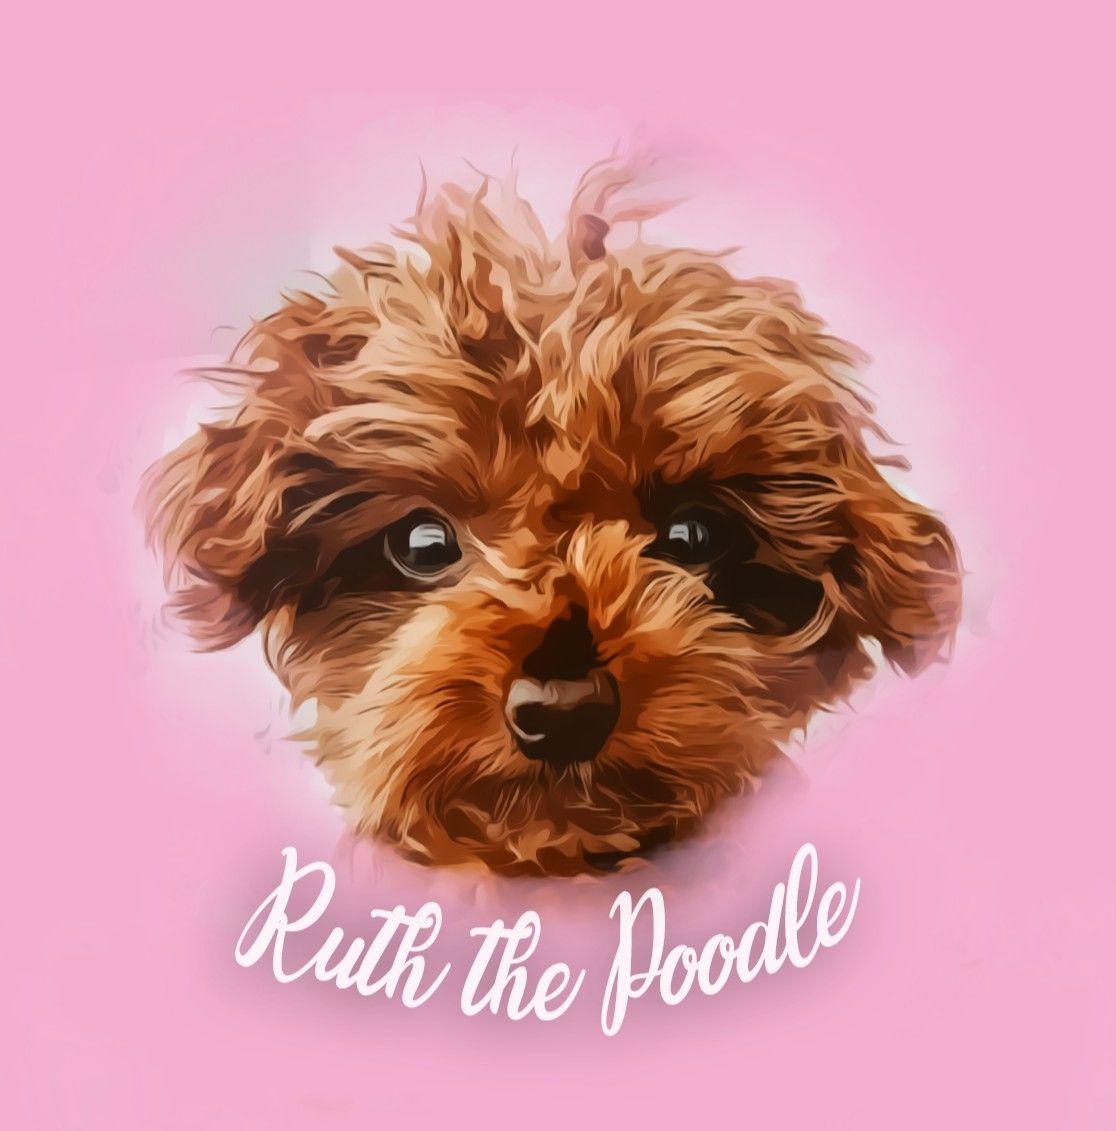 Profile Picture digital dog painting. In frame : @poodleruth • For Order Information click link in my bio. • #digitalpainting #animalpainting #petpainting #digitalart #oilpainting #profile #oilpainting #portrait #dogpainting #poodle #animallovers #photoshop #watercolor #catstagram #poodlelove #poodles #poodlesofinstagram #poodlepuppy #poodlemix #petportrait #dog #animals #doglovers